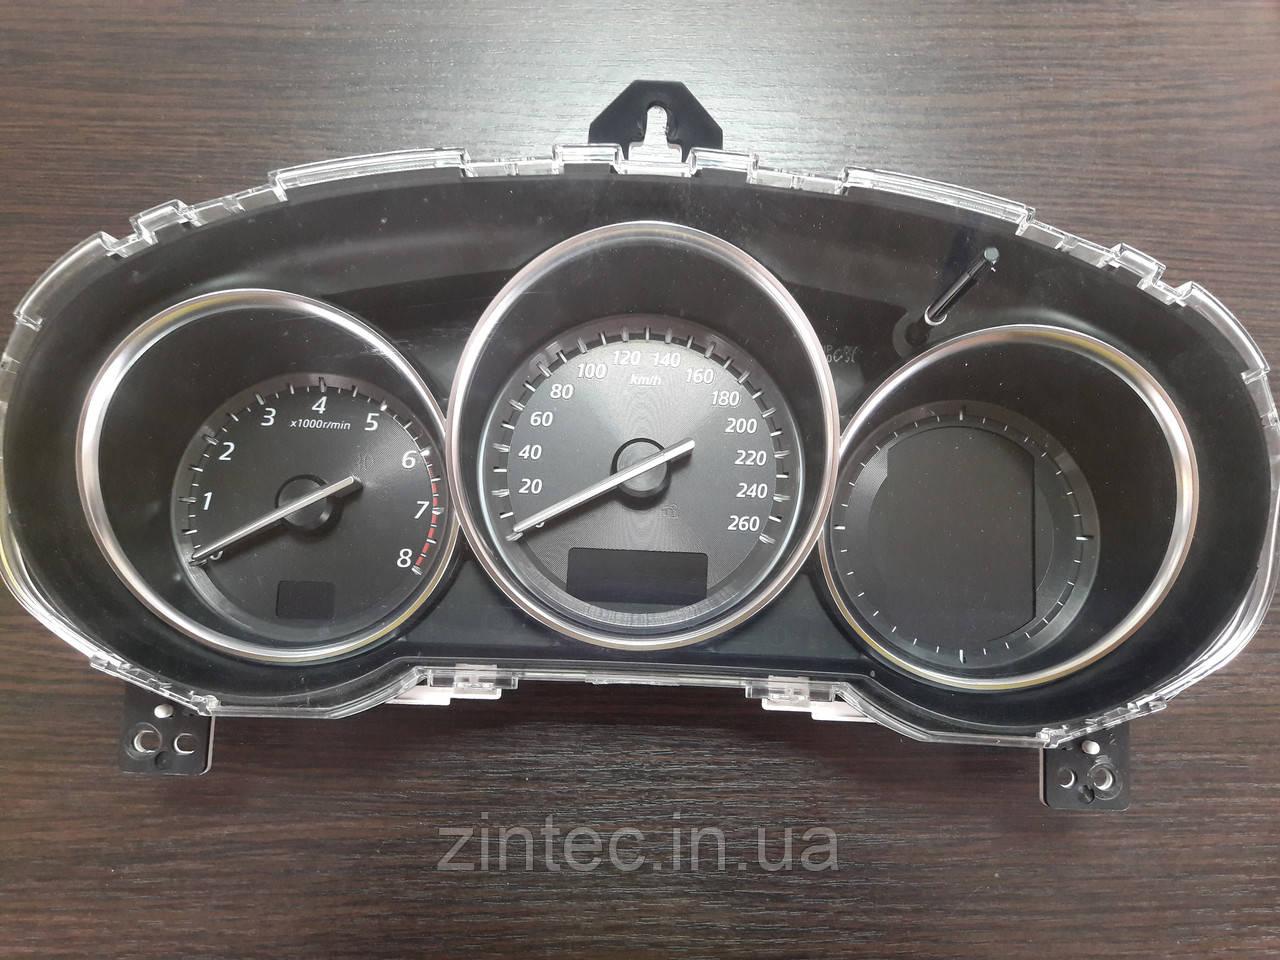 Щиток приборов Mazda CX5 2015-16г. 099-5454-777